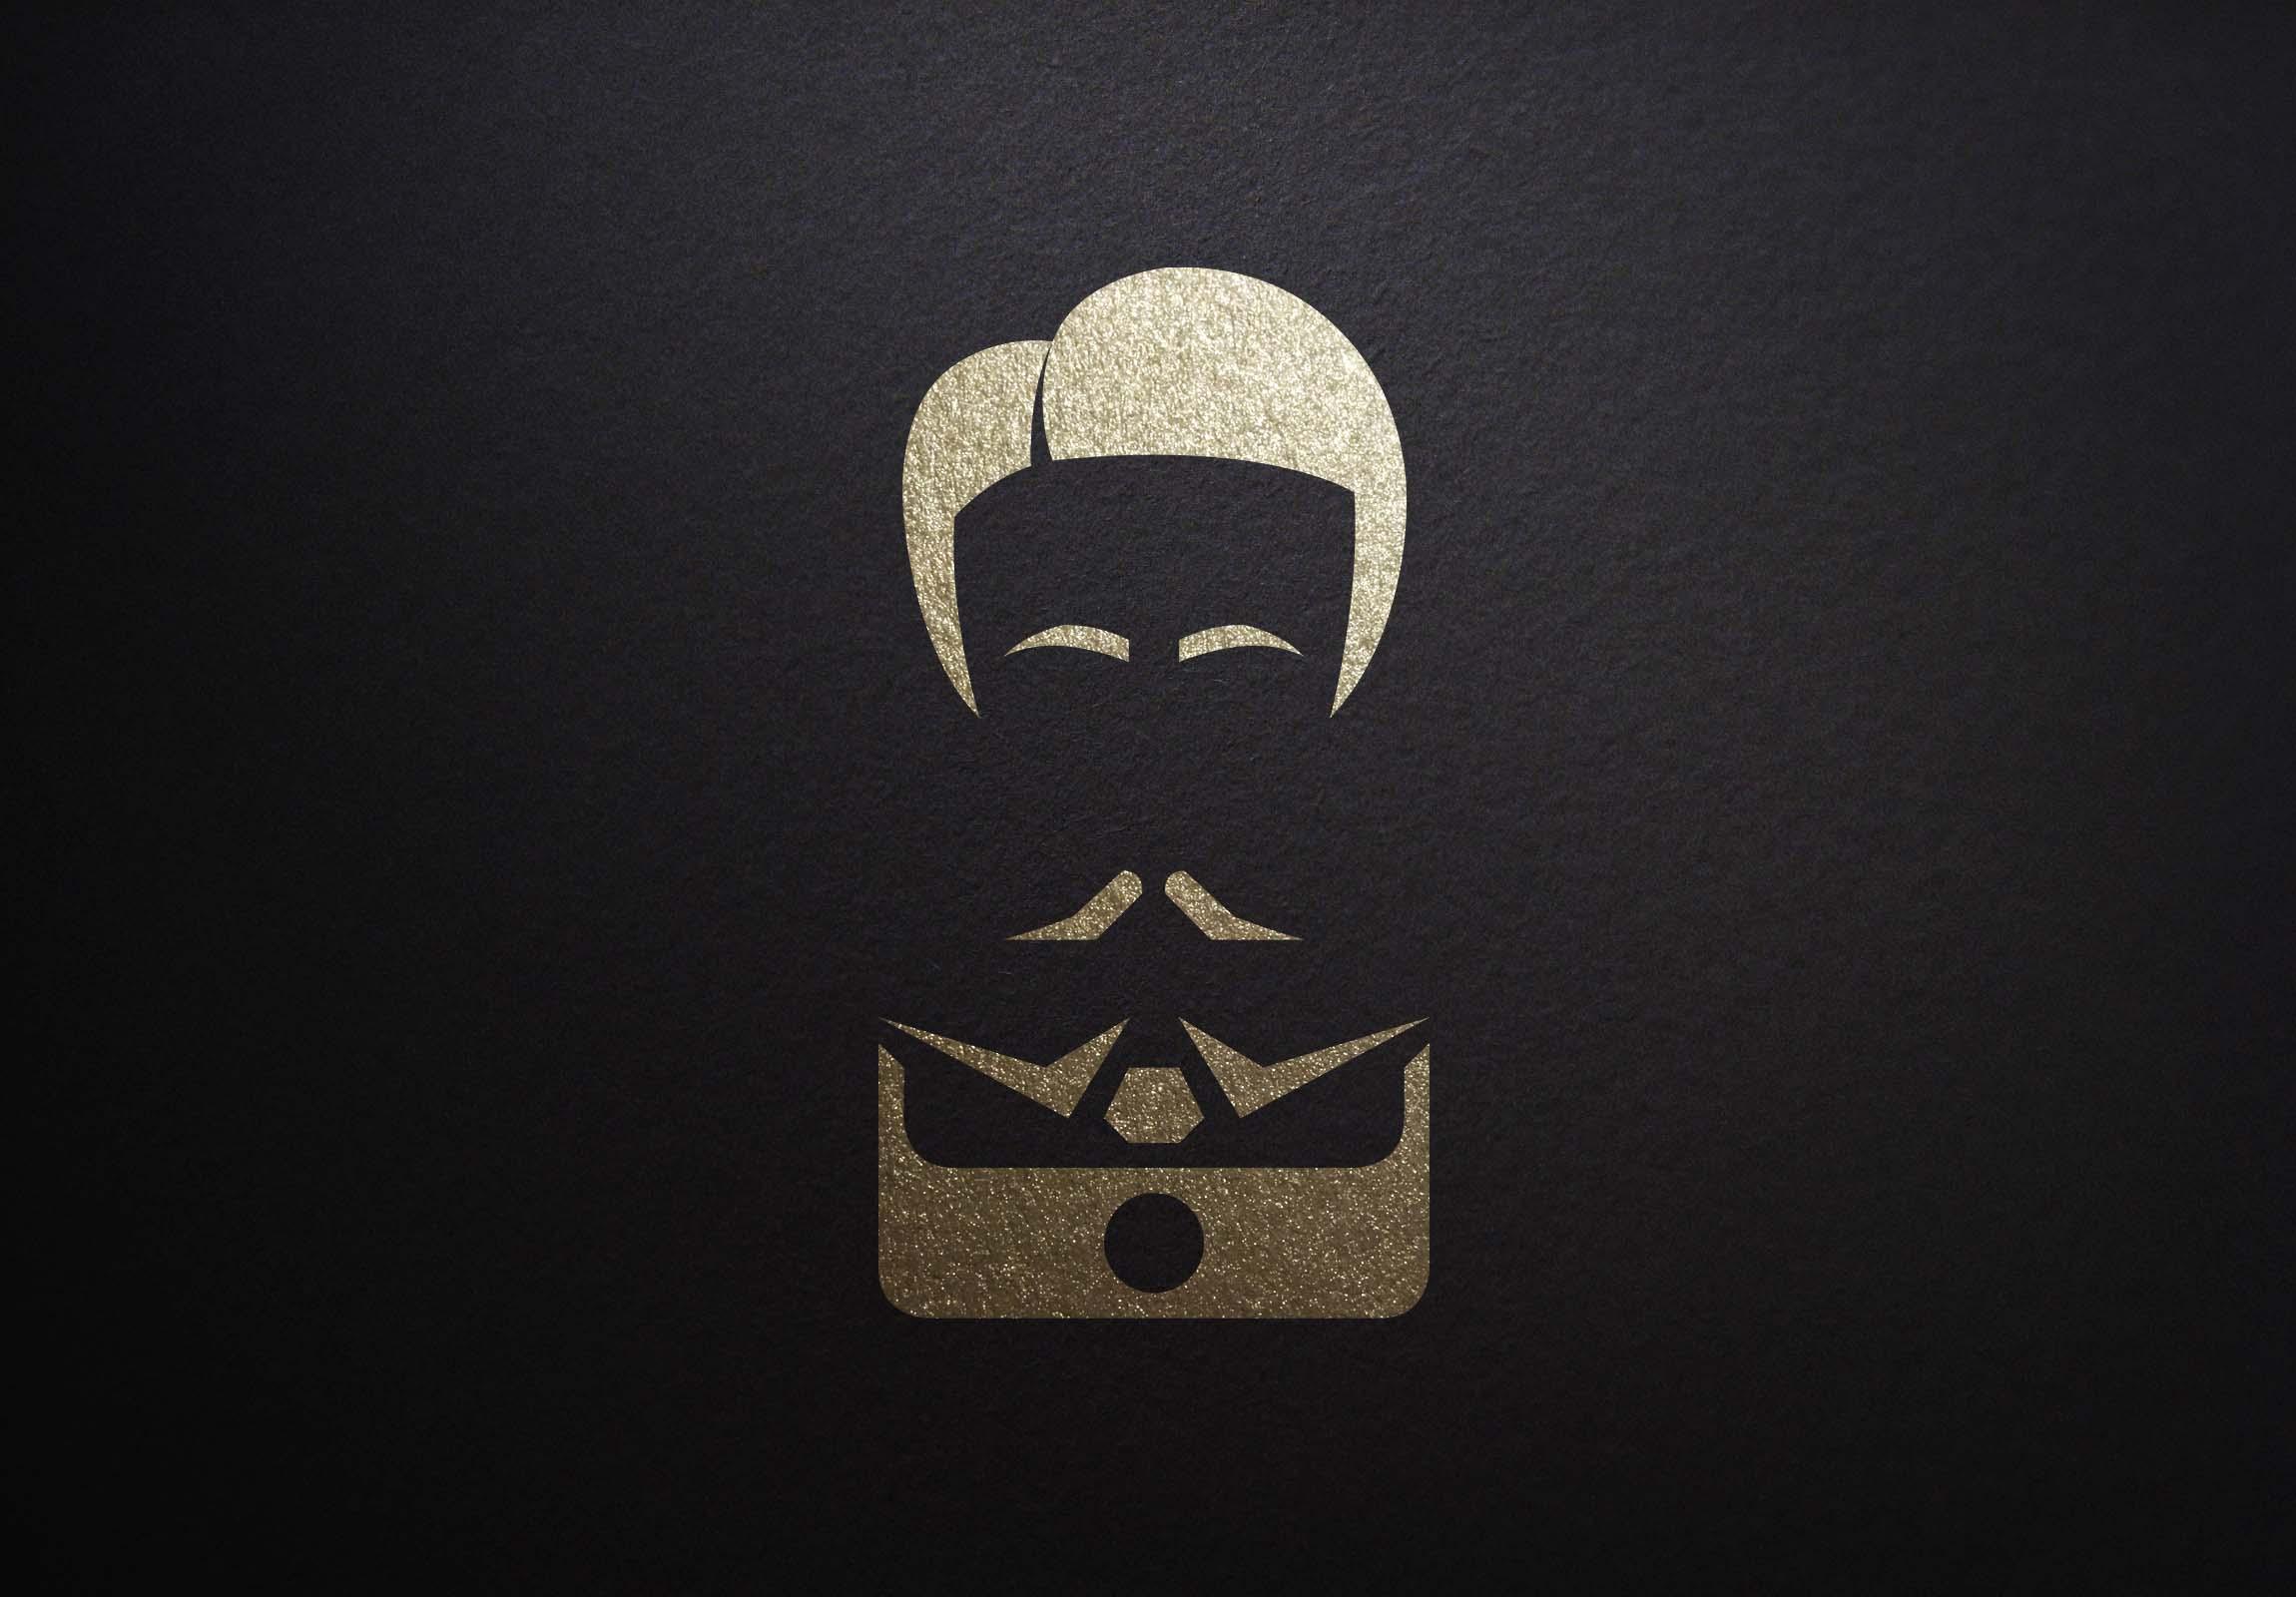 Разработка Логотипа 6 000 руб. фото f_64958f88de6e38a8.jpg